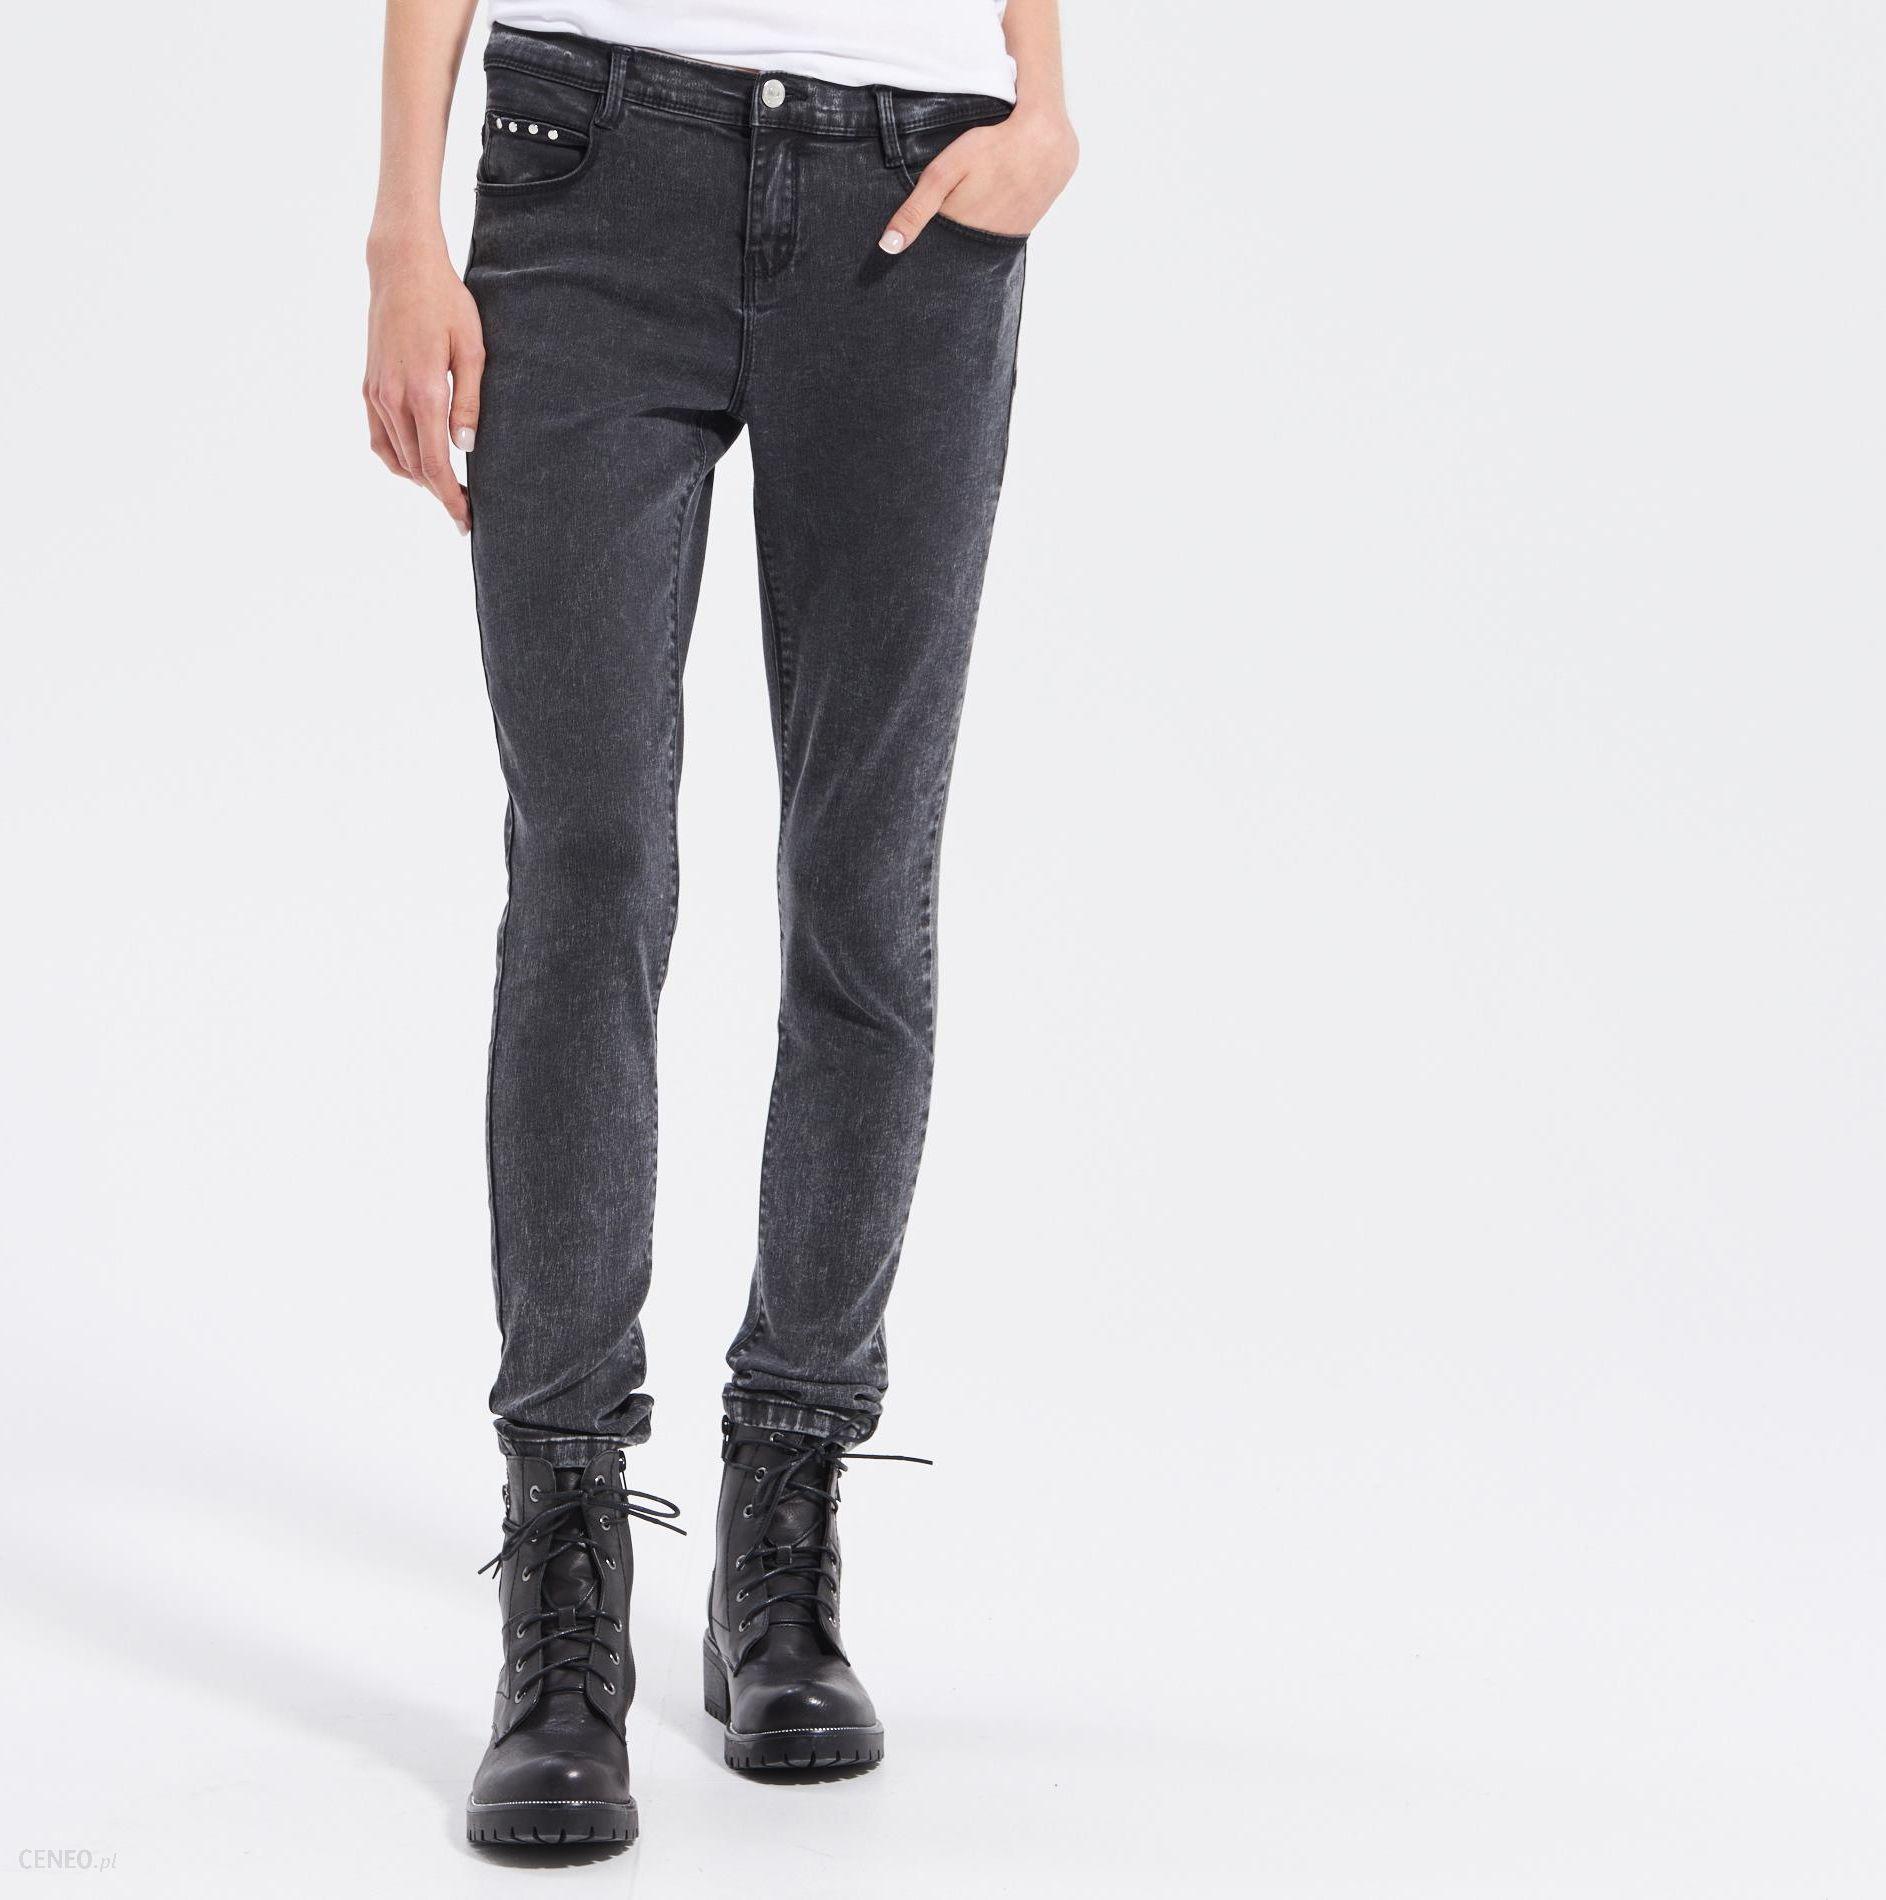 66f0cffc9e887 Sinsay - Marmurkowe jeansy slim fit - Szary - damska - Ceny i opinie ...